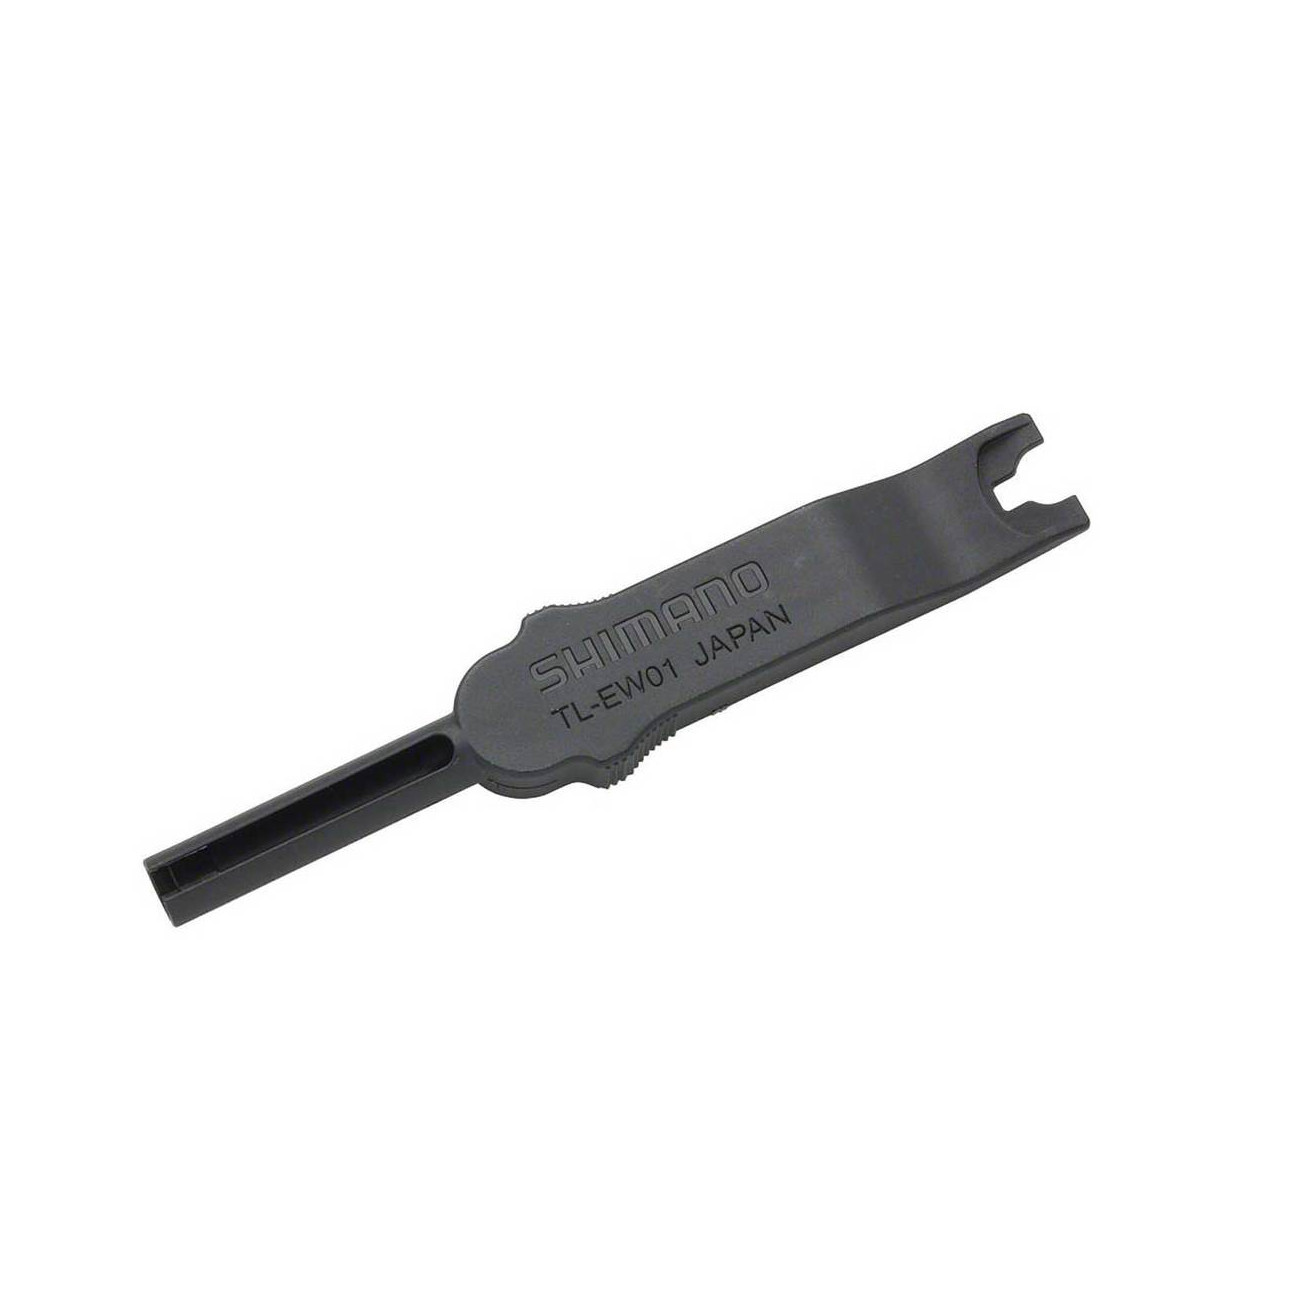 Shimano TL-EW01 Plug Tool